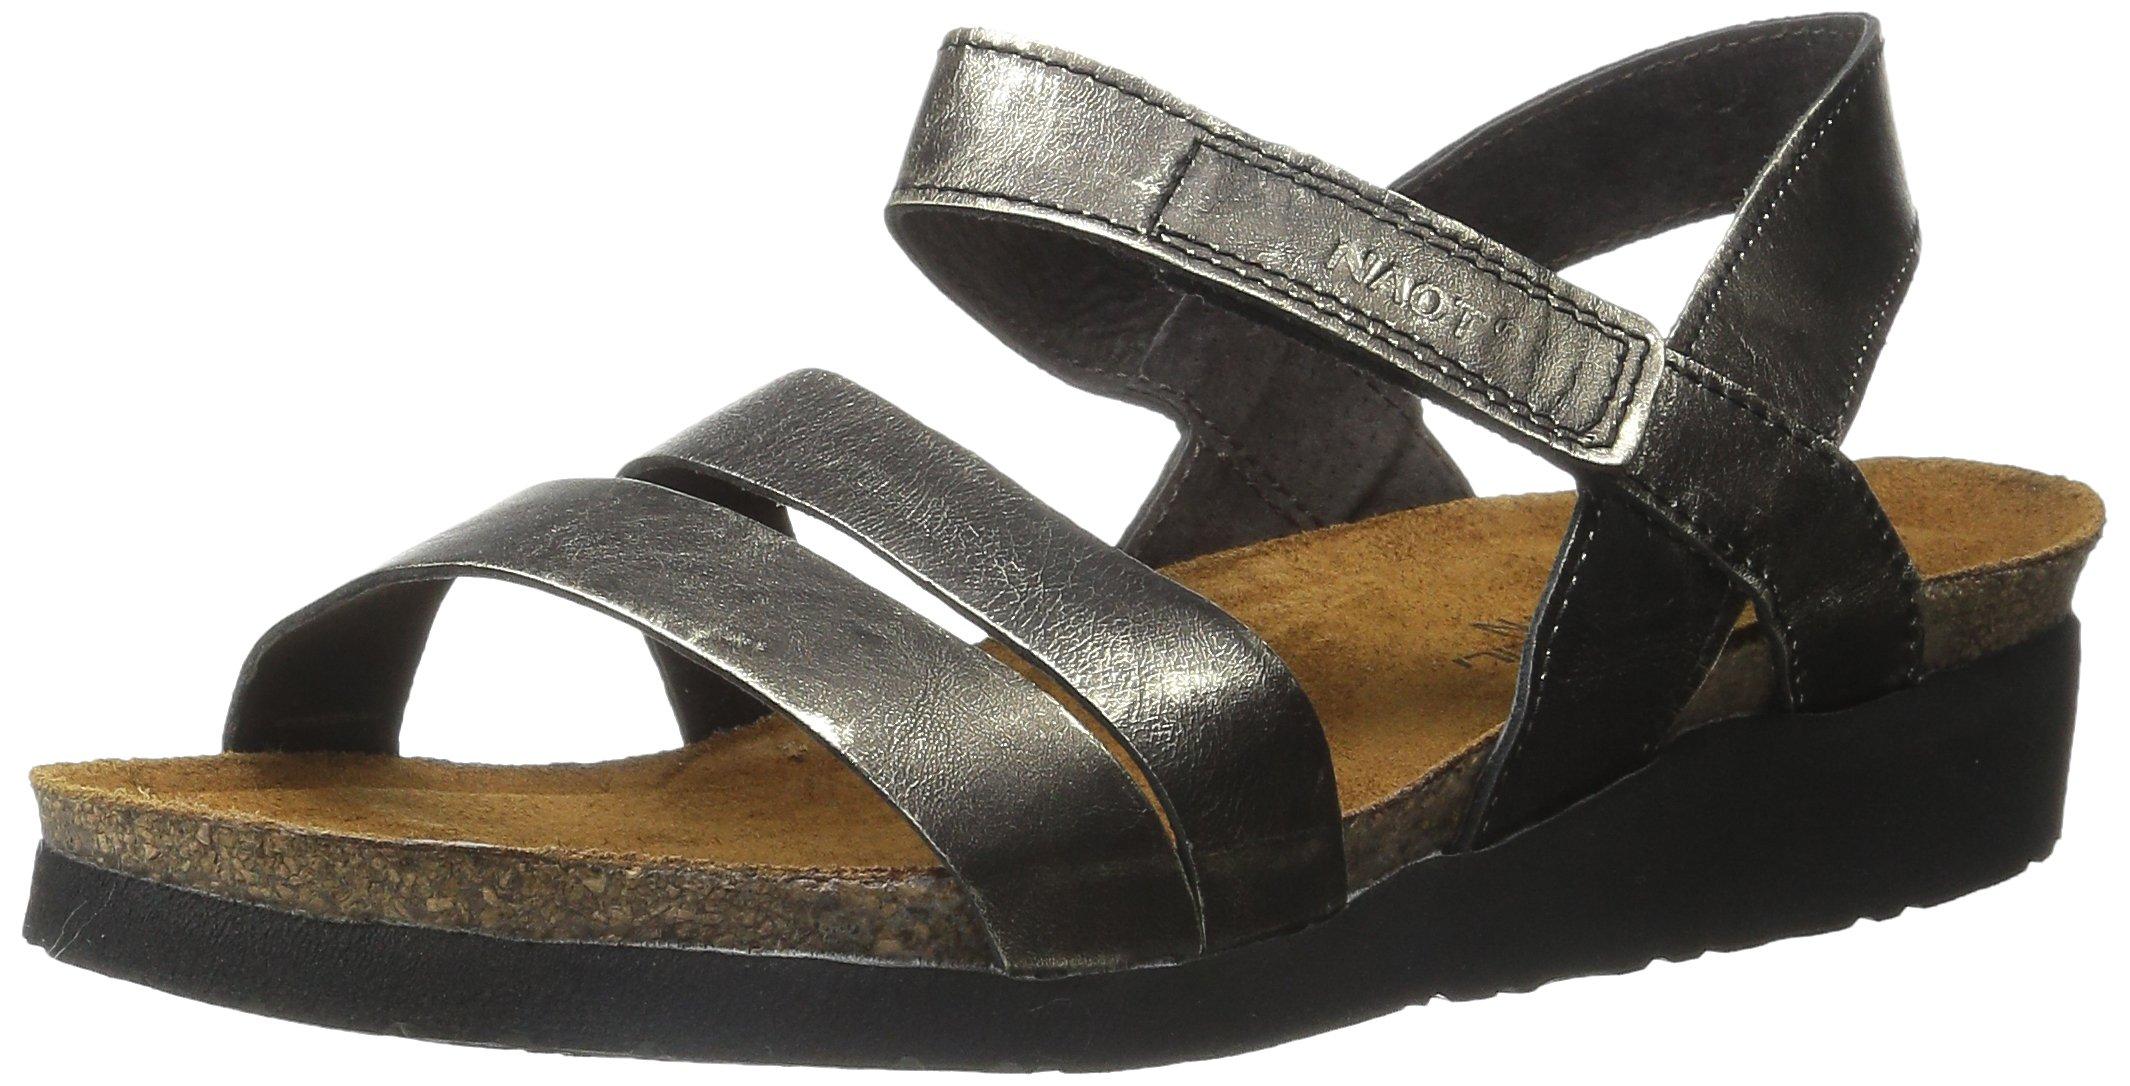 Naot Women's Kayla Wedge Sandal, Metal Leather, 37 EU/6 M US